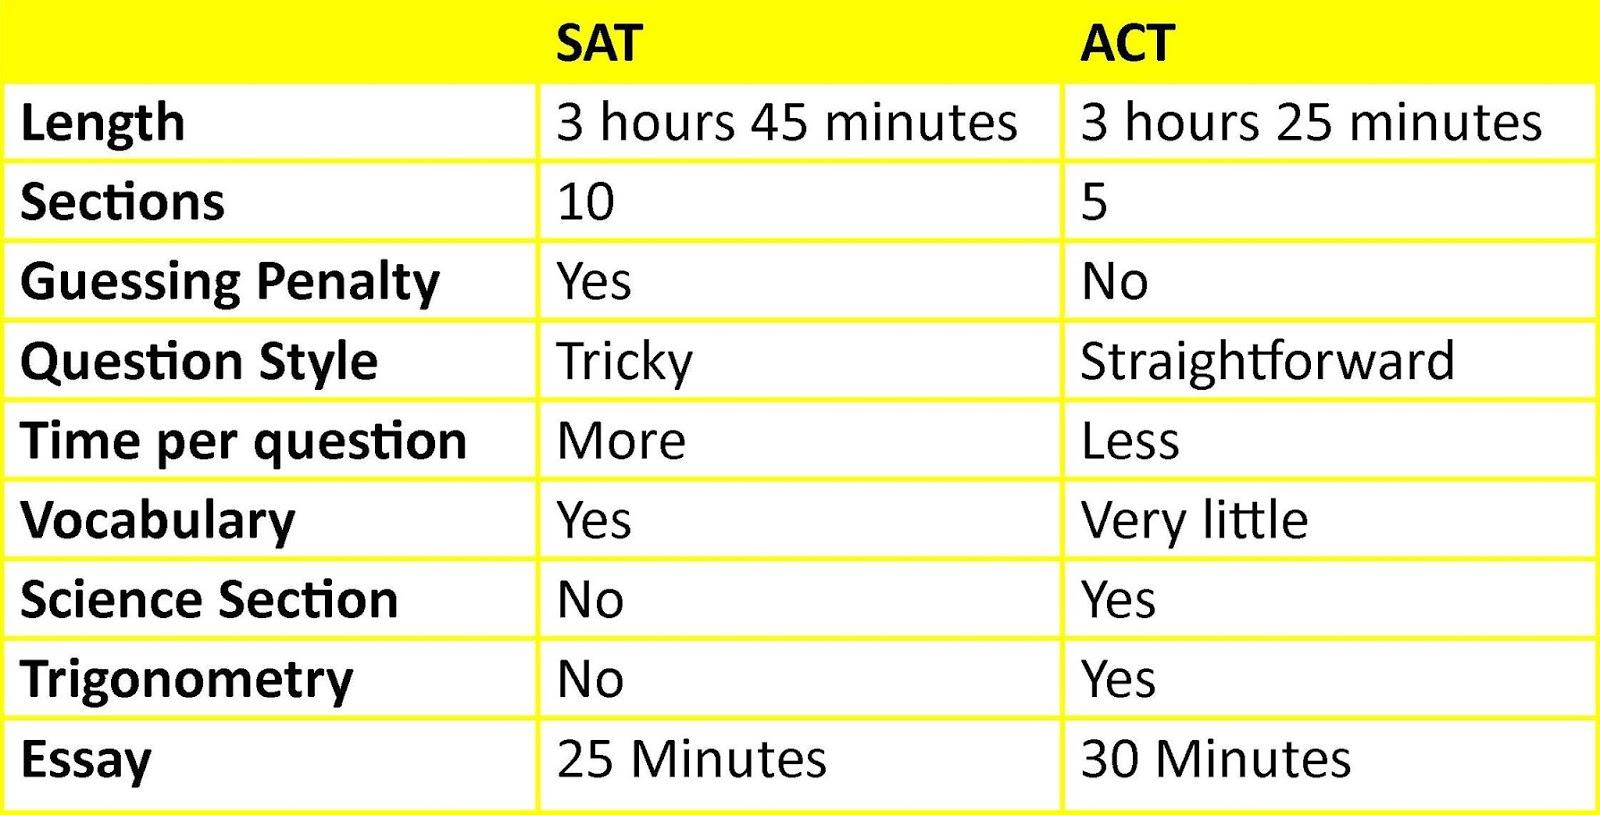 act essay vs sat essay